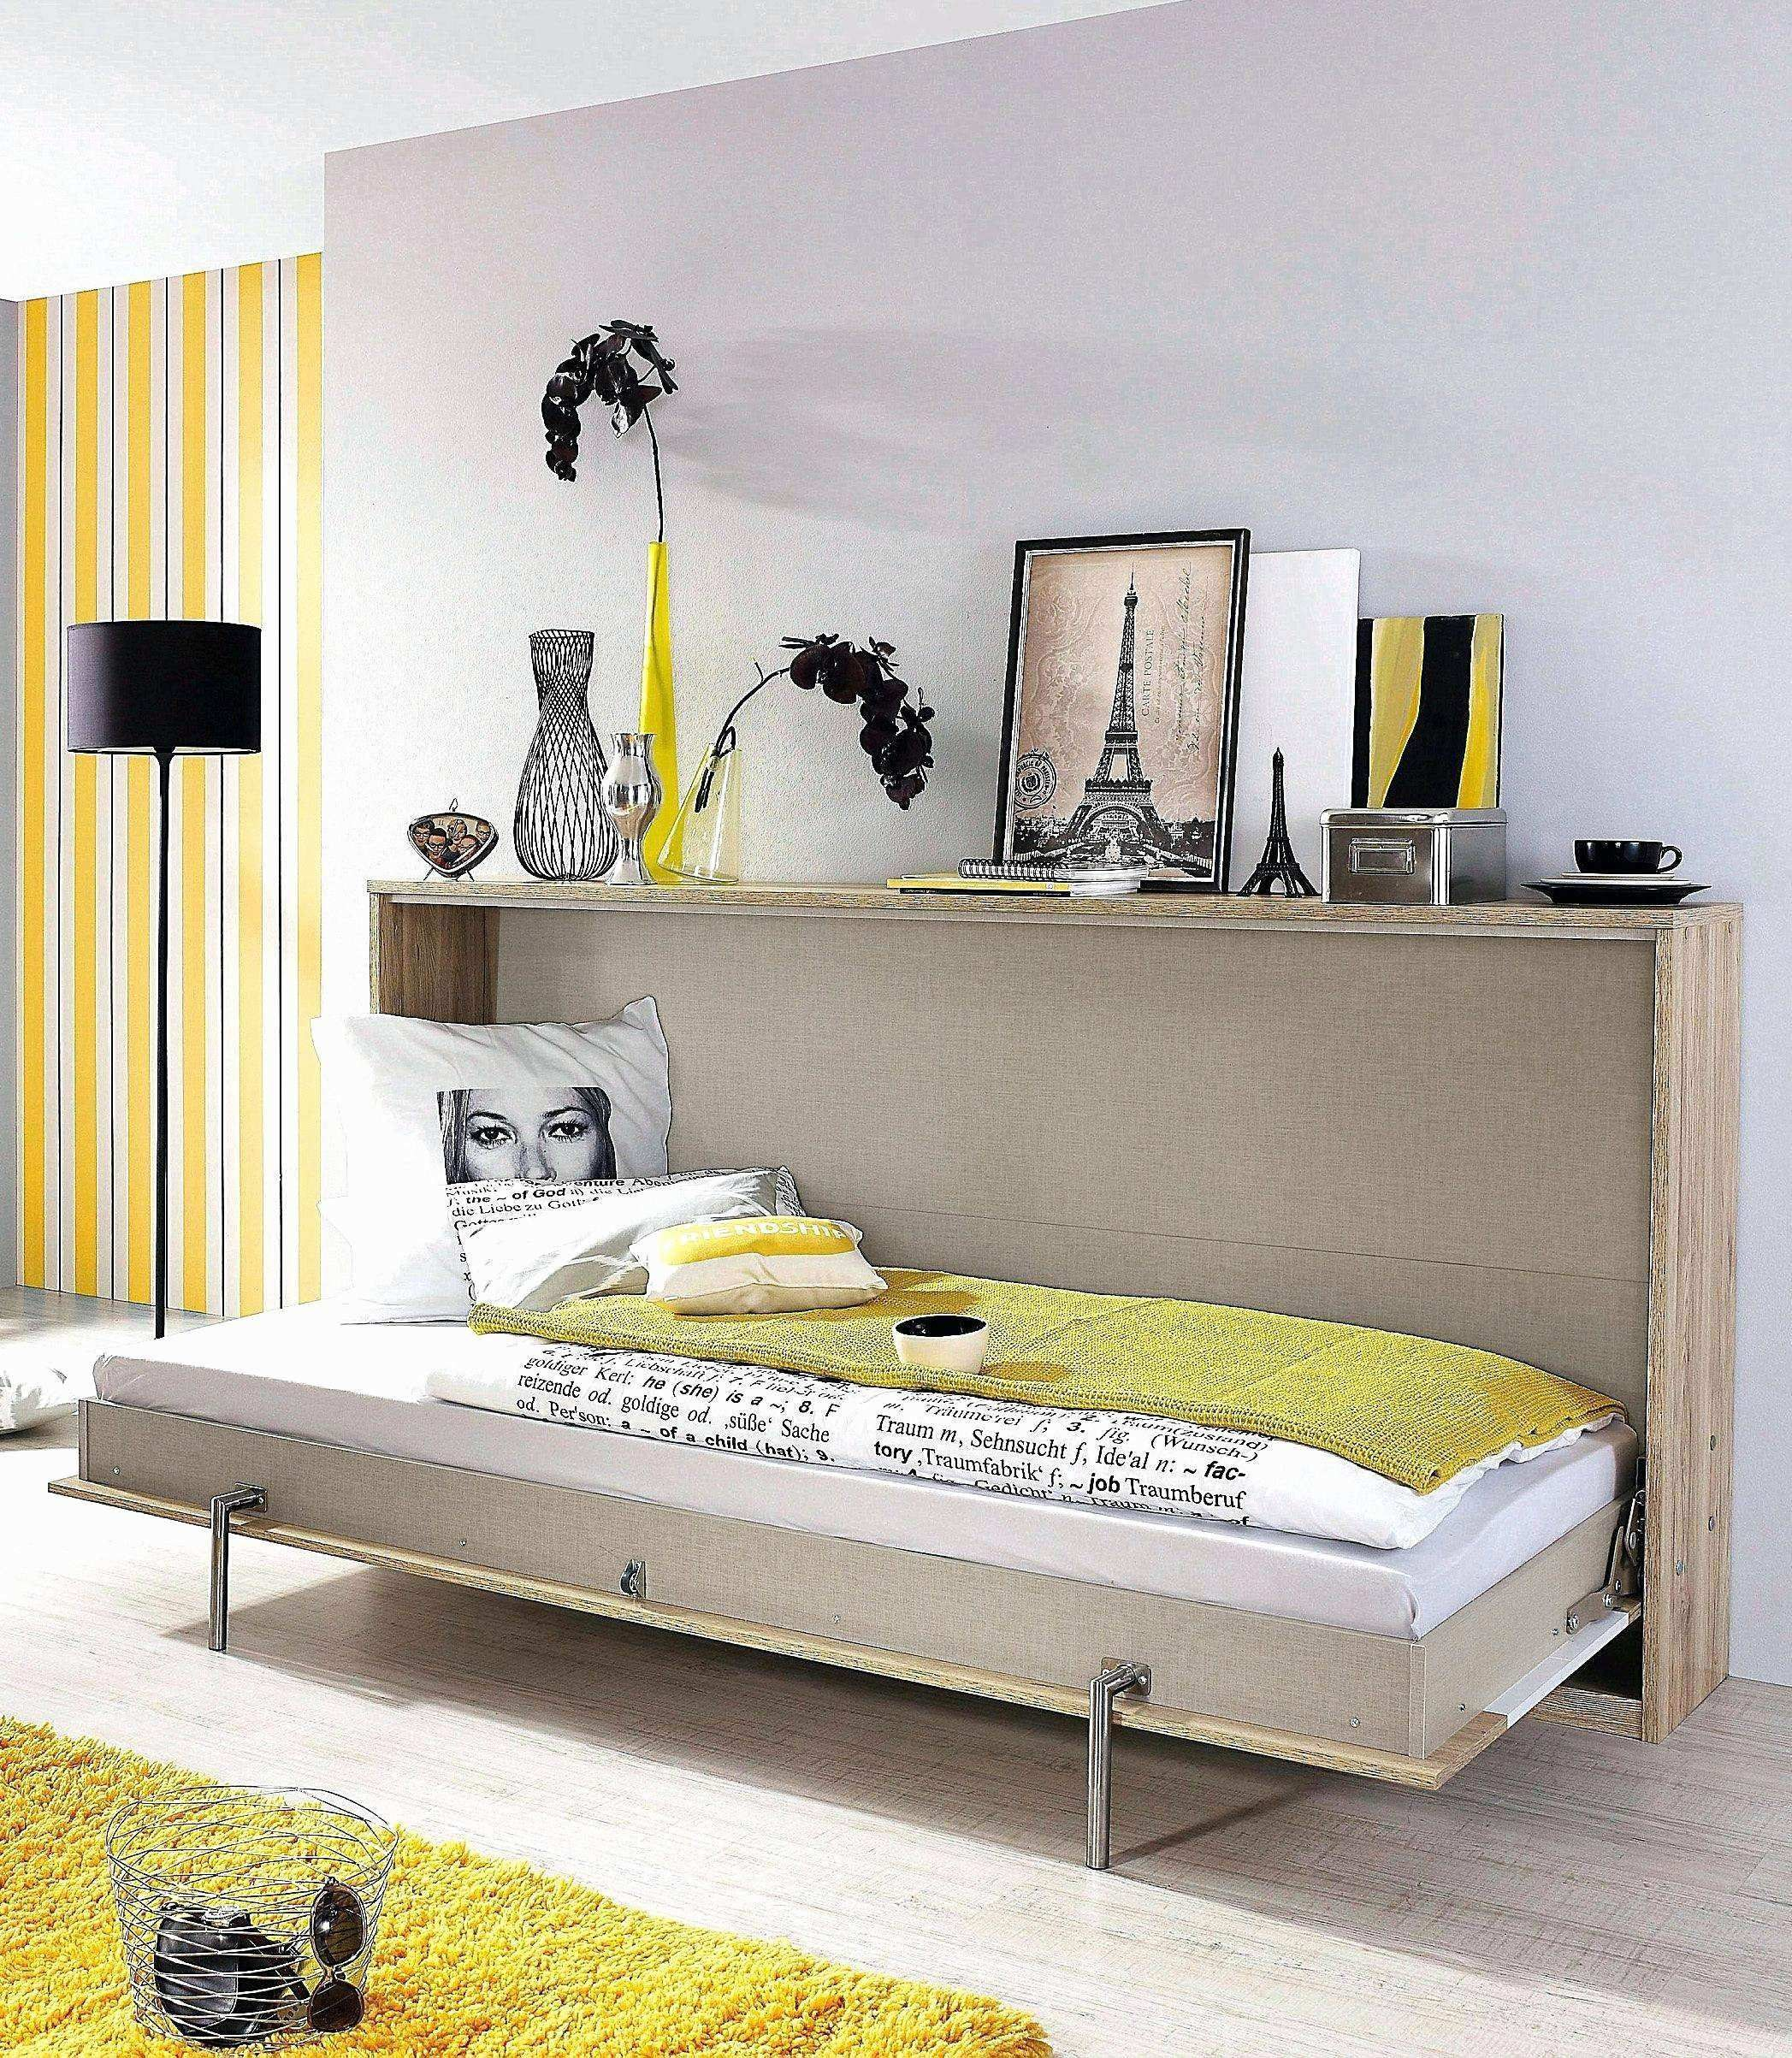 Lit Queen Size Ikea Joli Platform Bed Frame Queen Ikea Beautiful Bed Queen Frames Ikea Queen